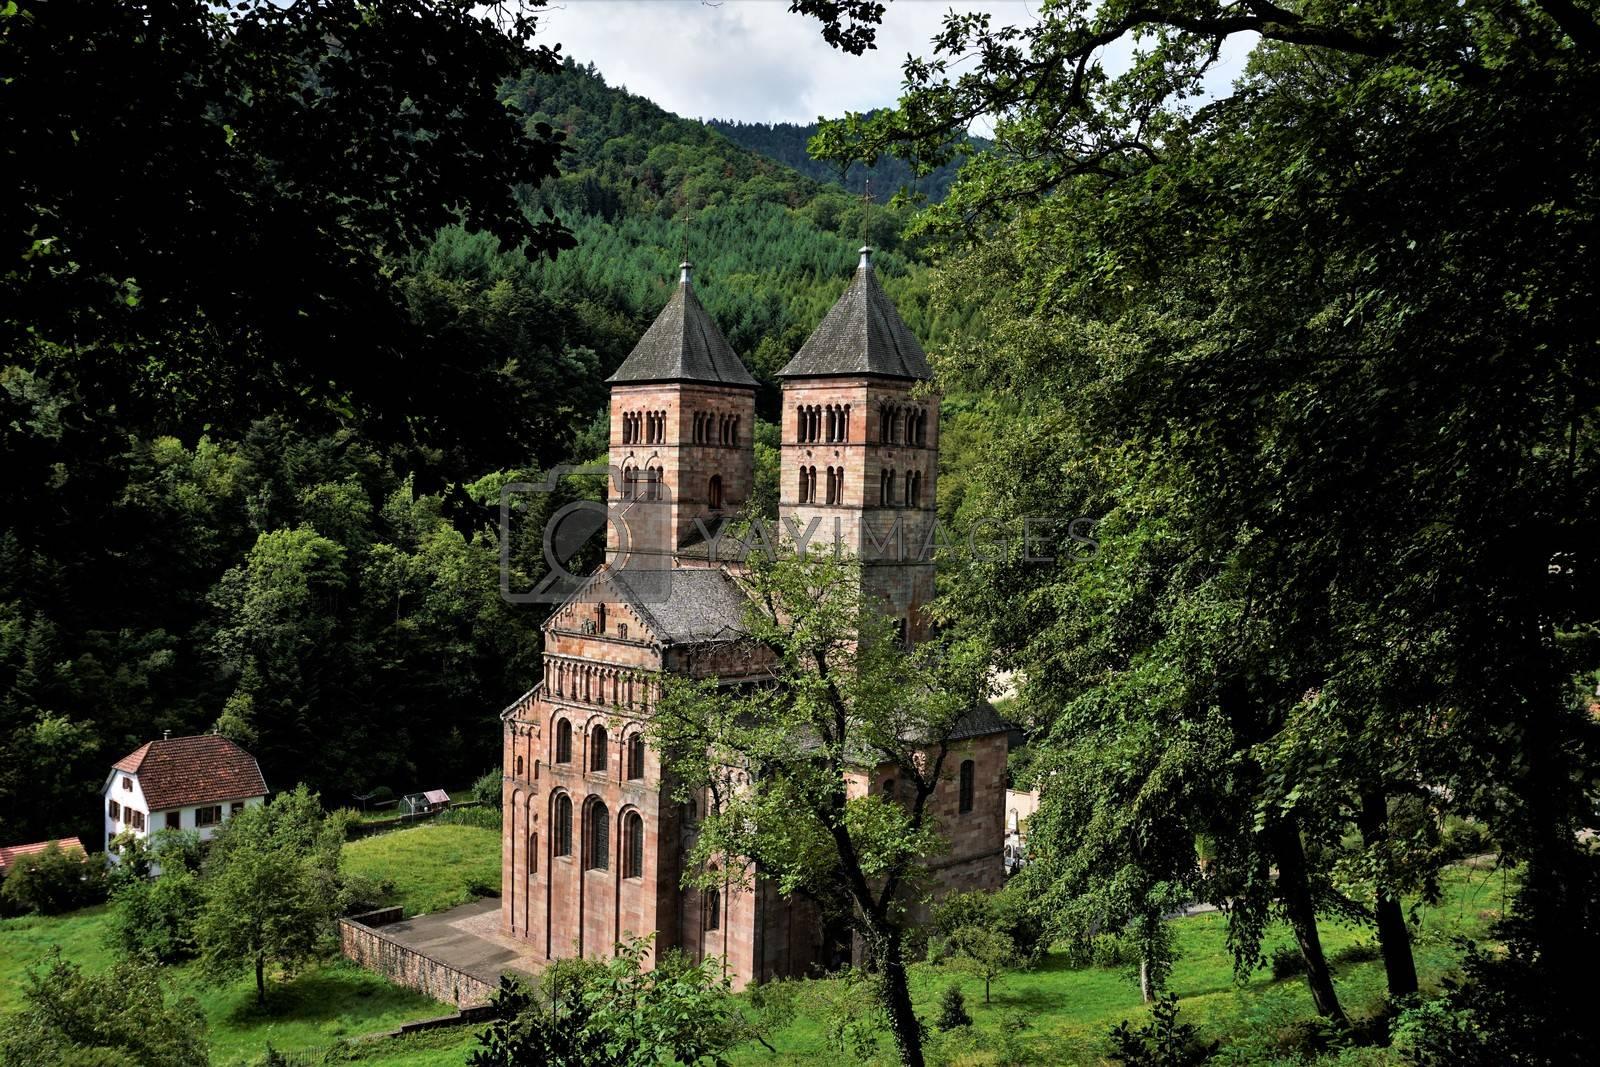 Murbach Abbey hidden behind trees with town hall of Murbach, France